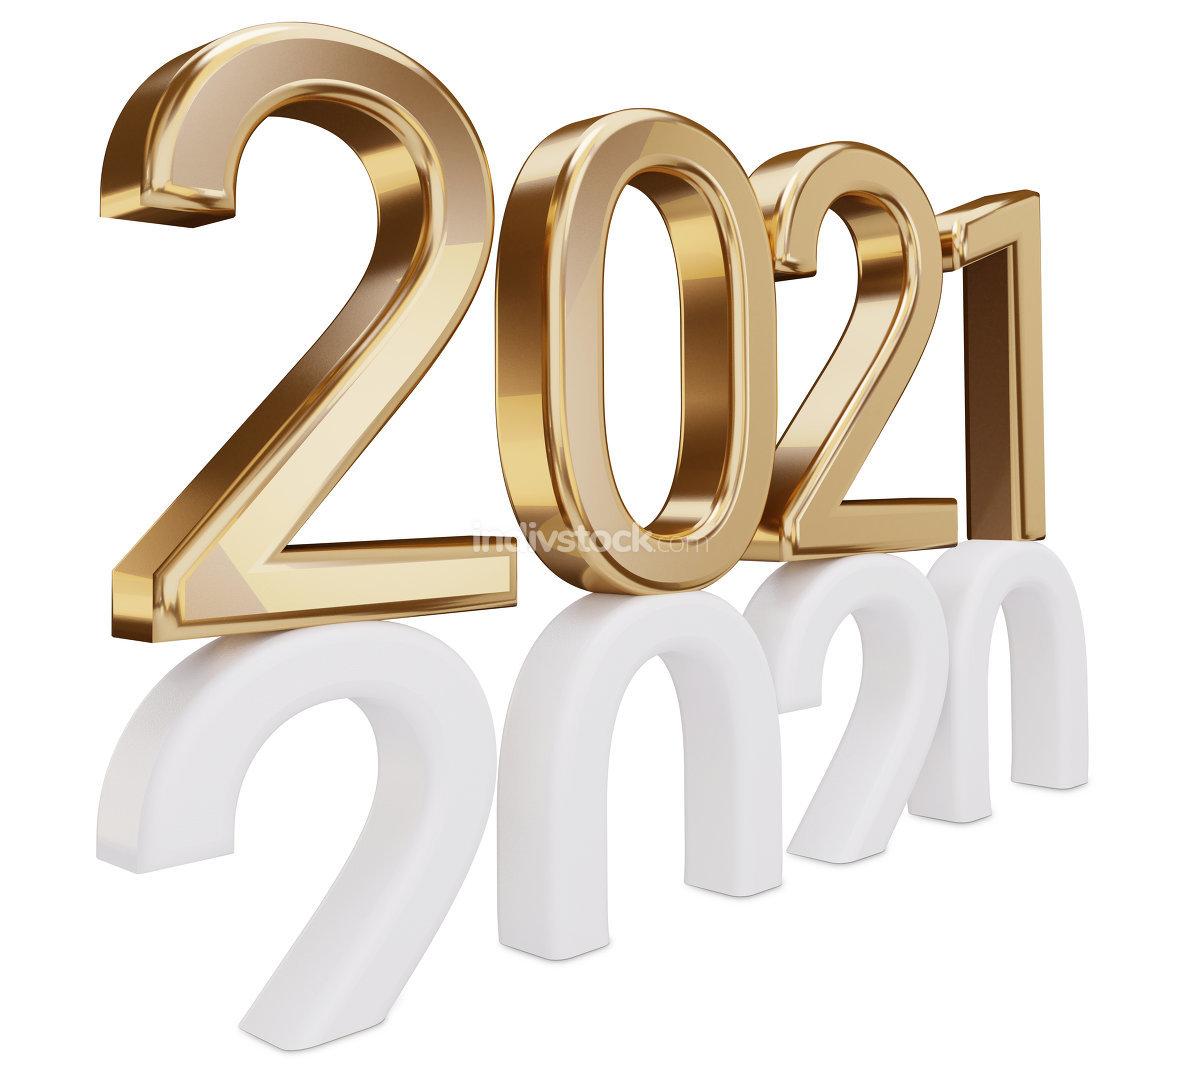 2021 golden metallic thin letters 3d-illustration